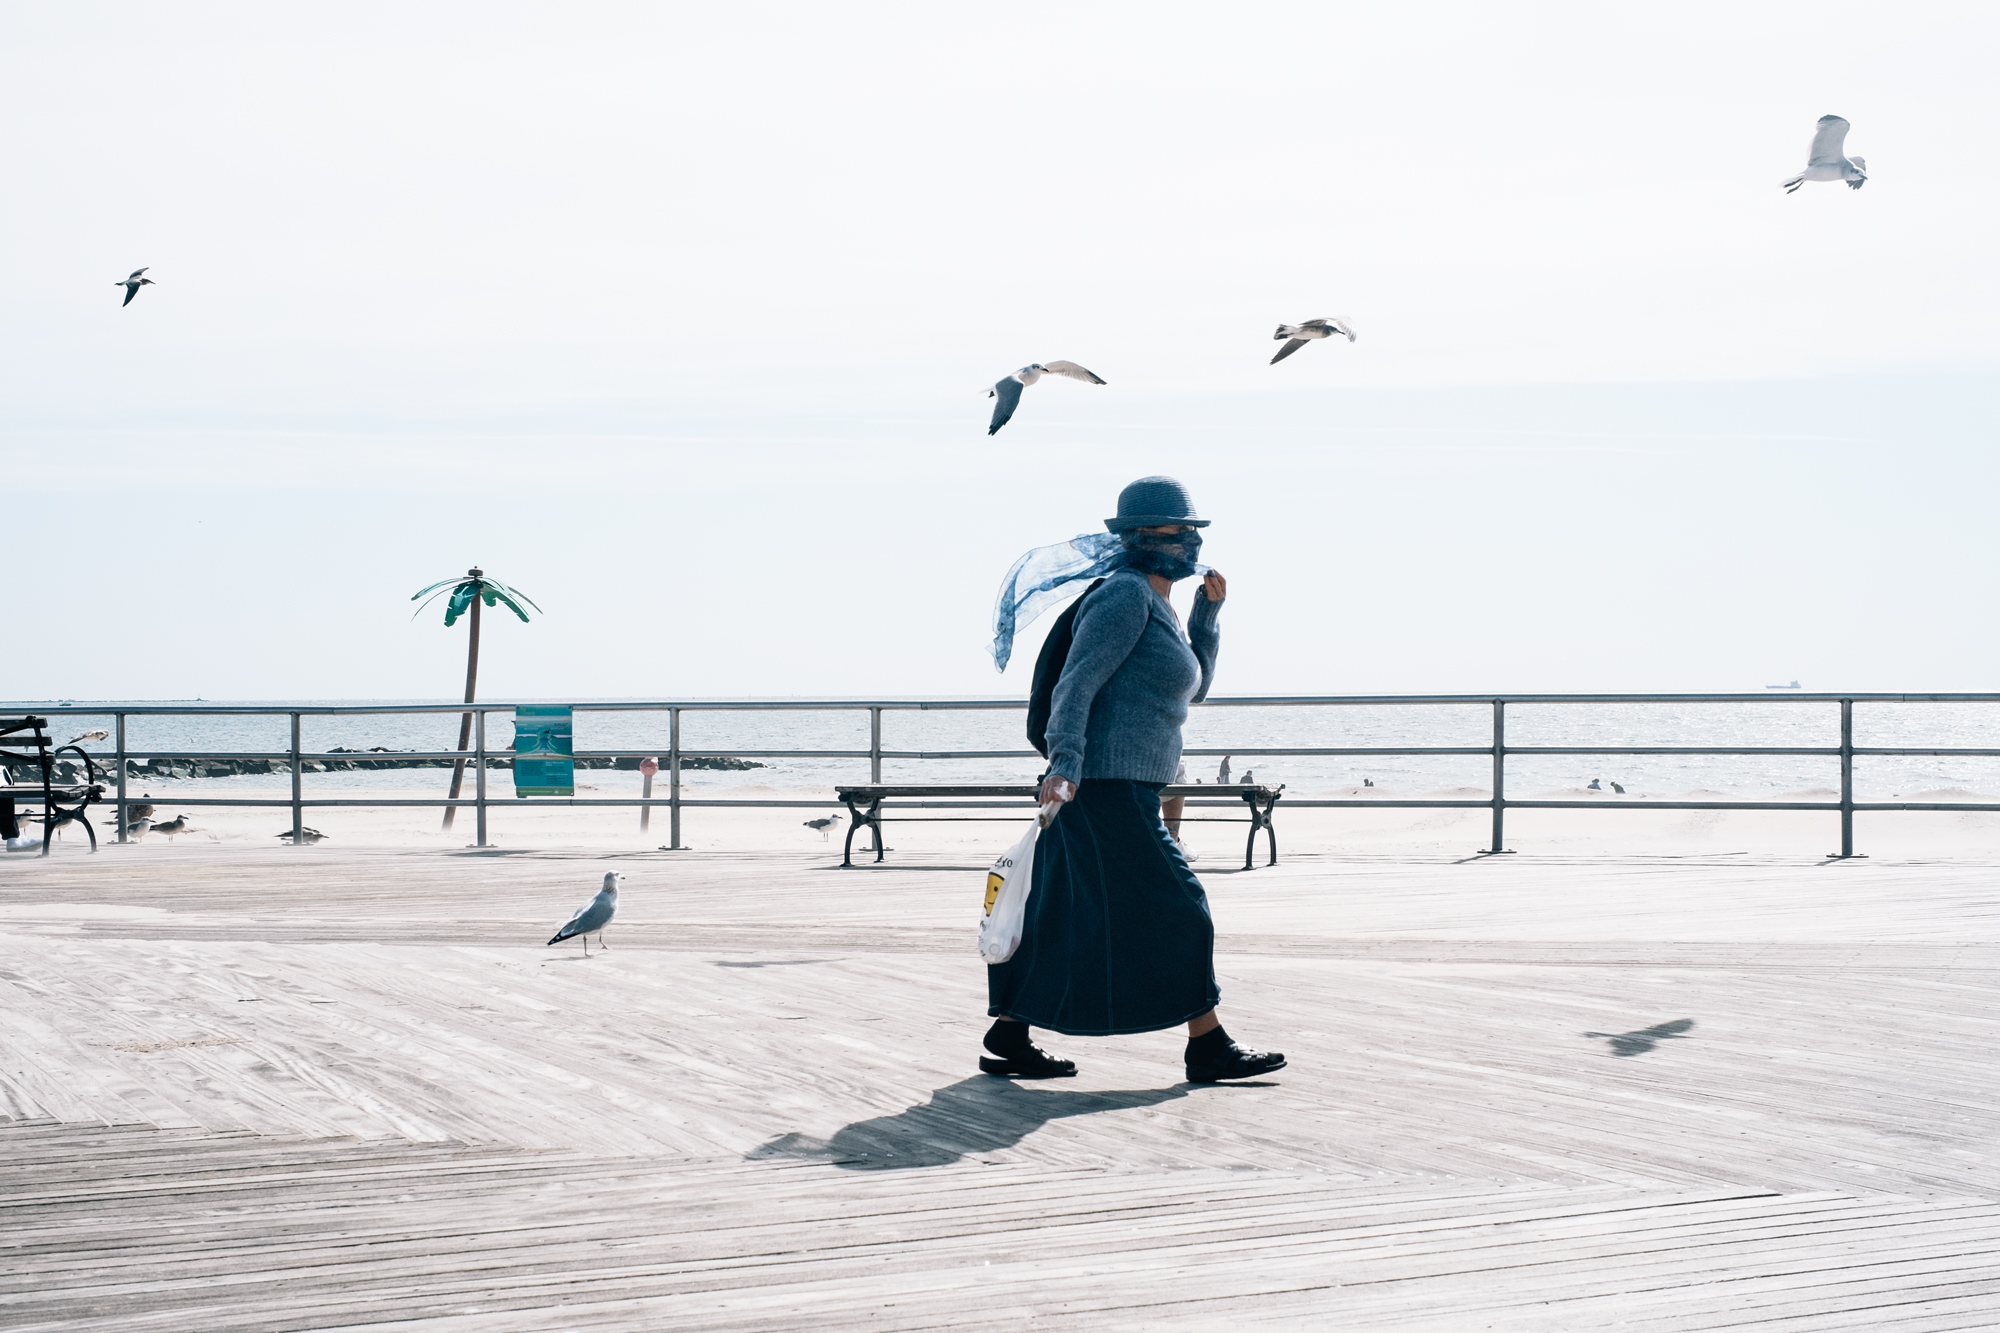 Mariah-Tyler-Coney-Island-New-York-2014.jpg